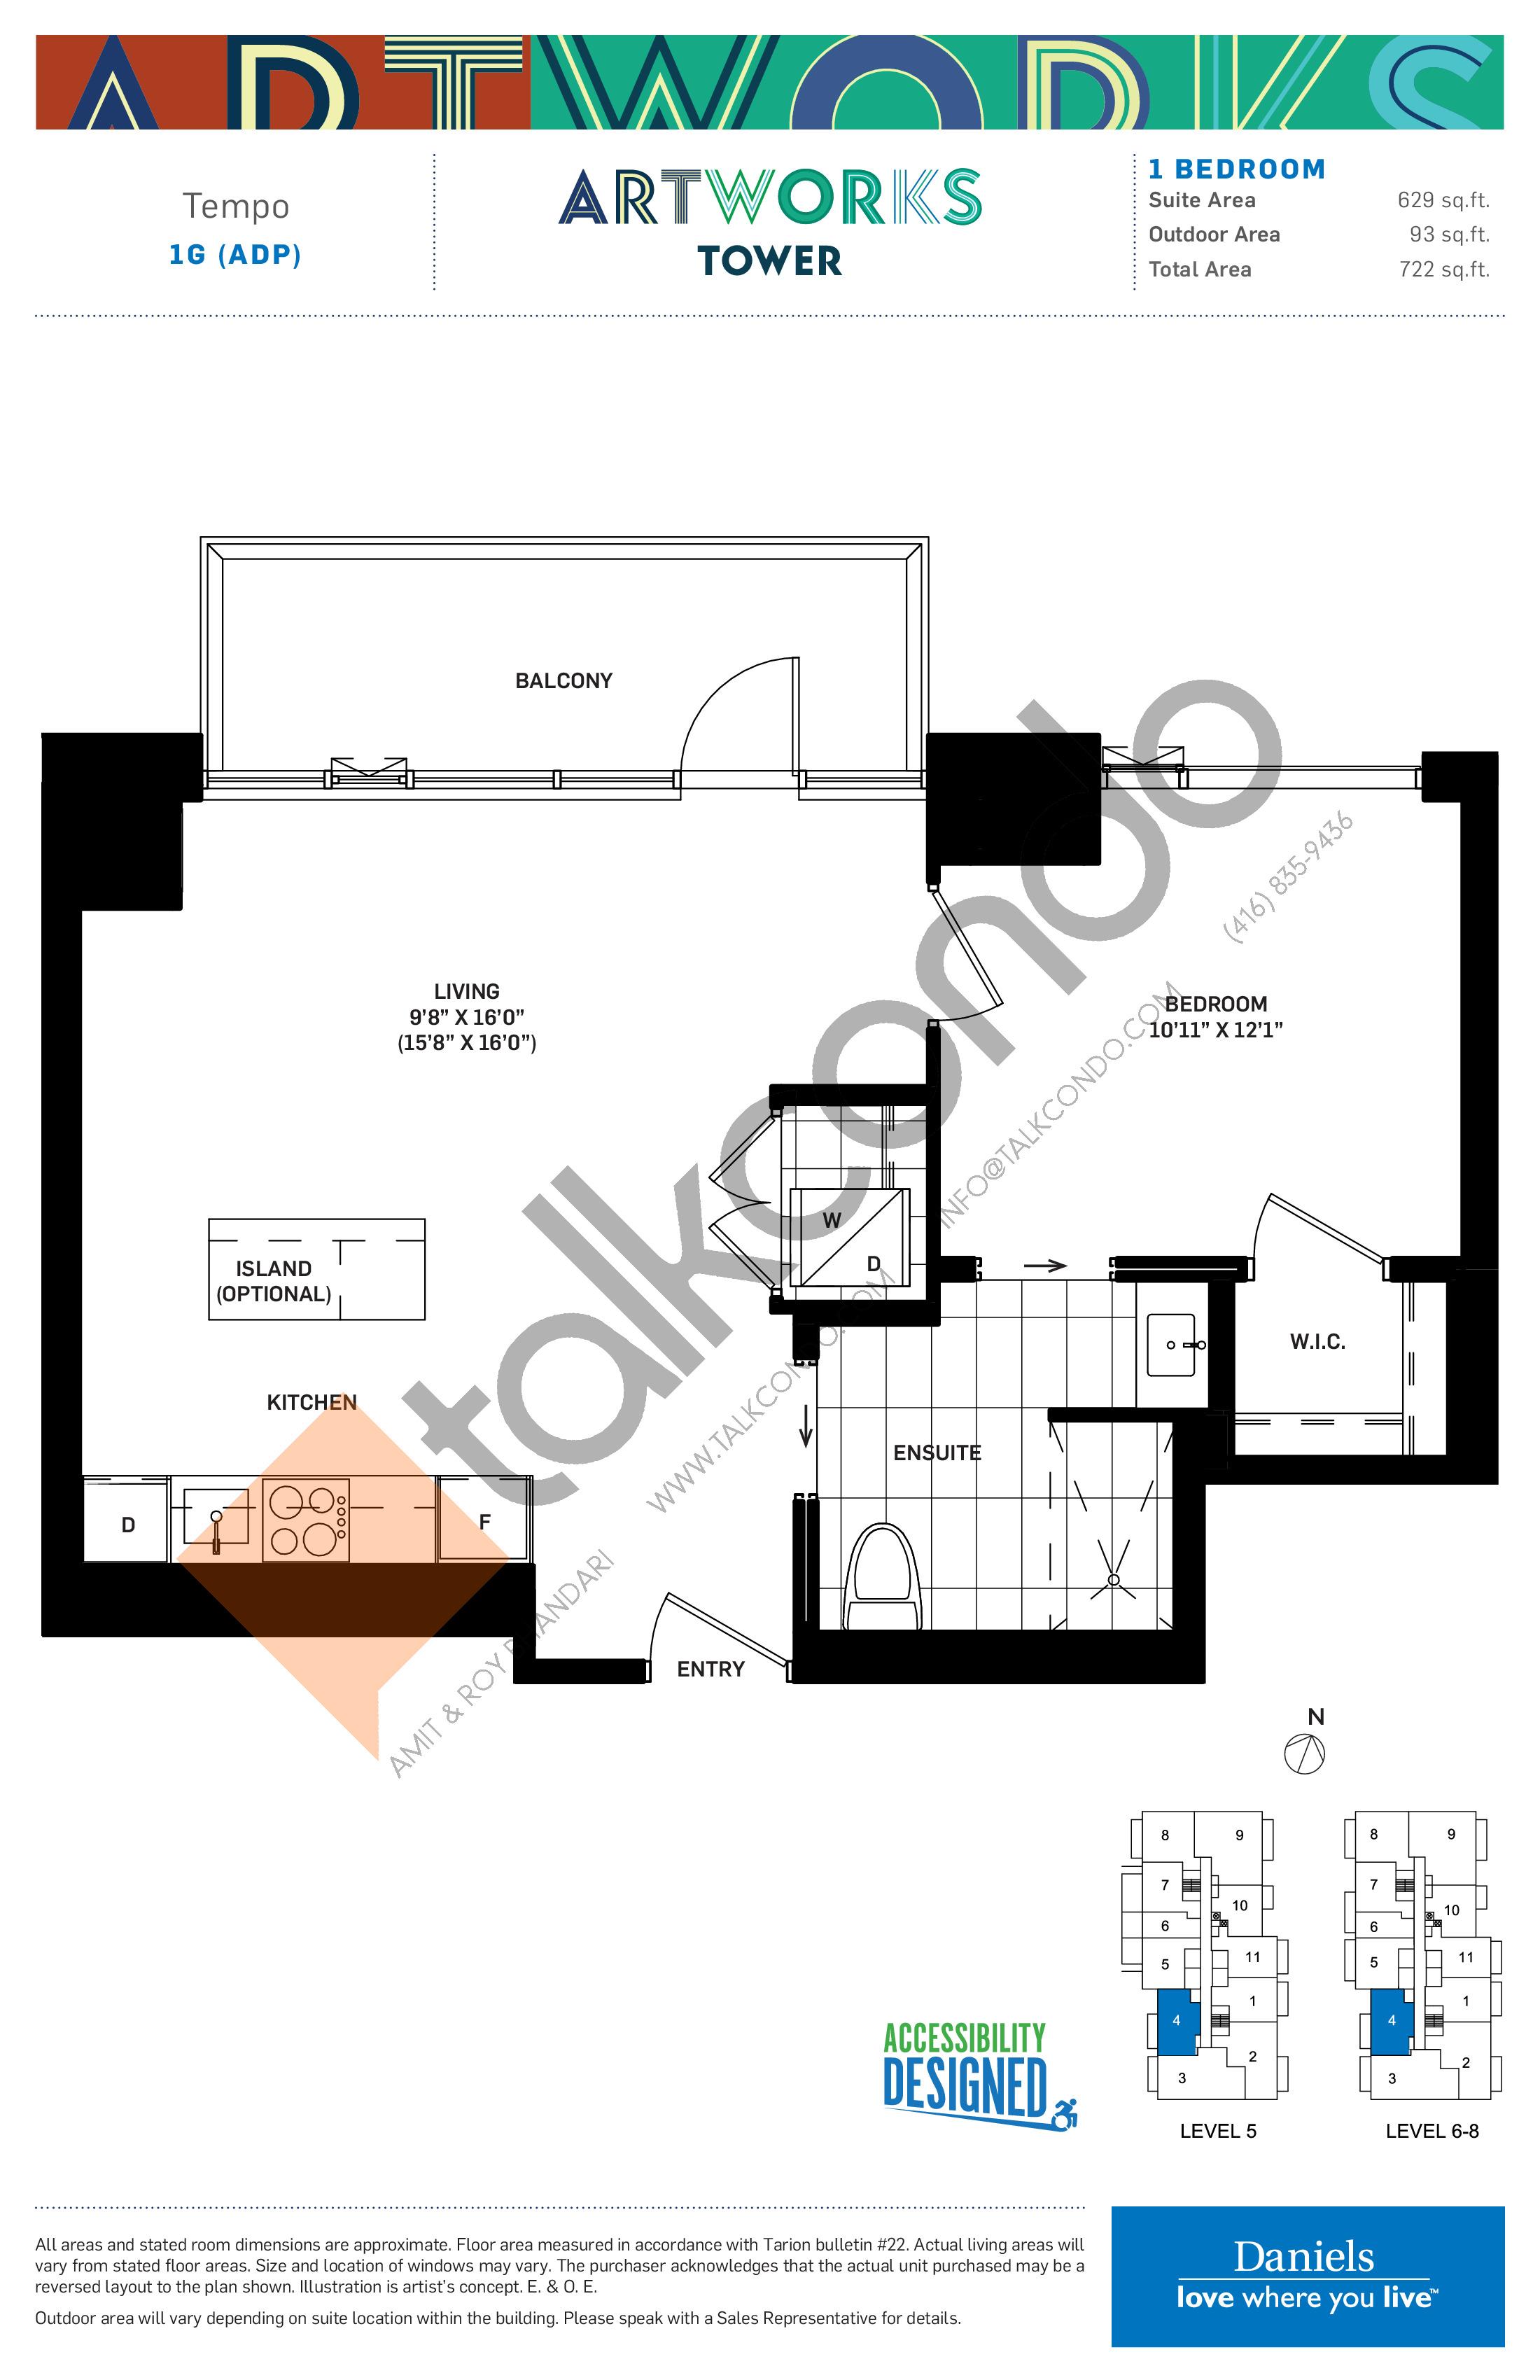 Tempo Floor Plan at Artworks Tower Condos - 629 sq.ft